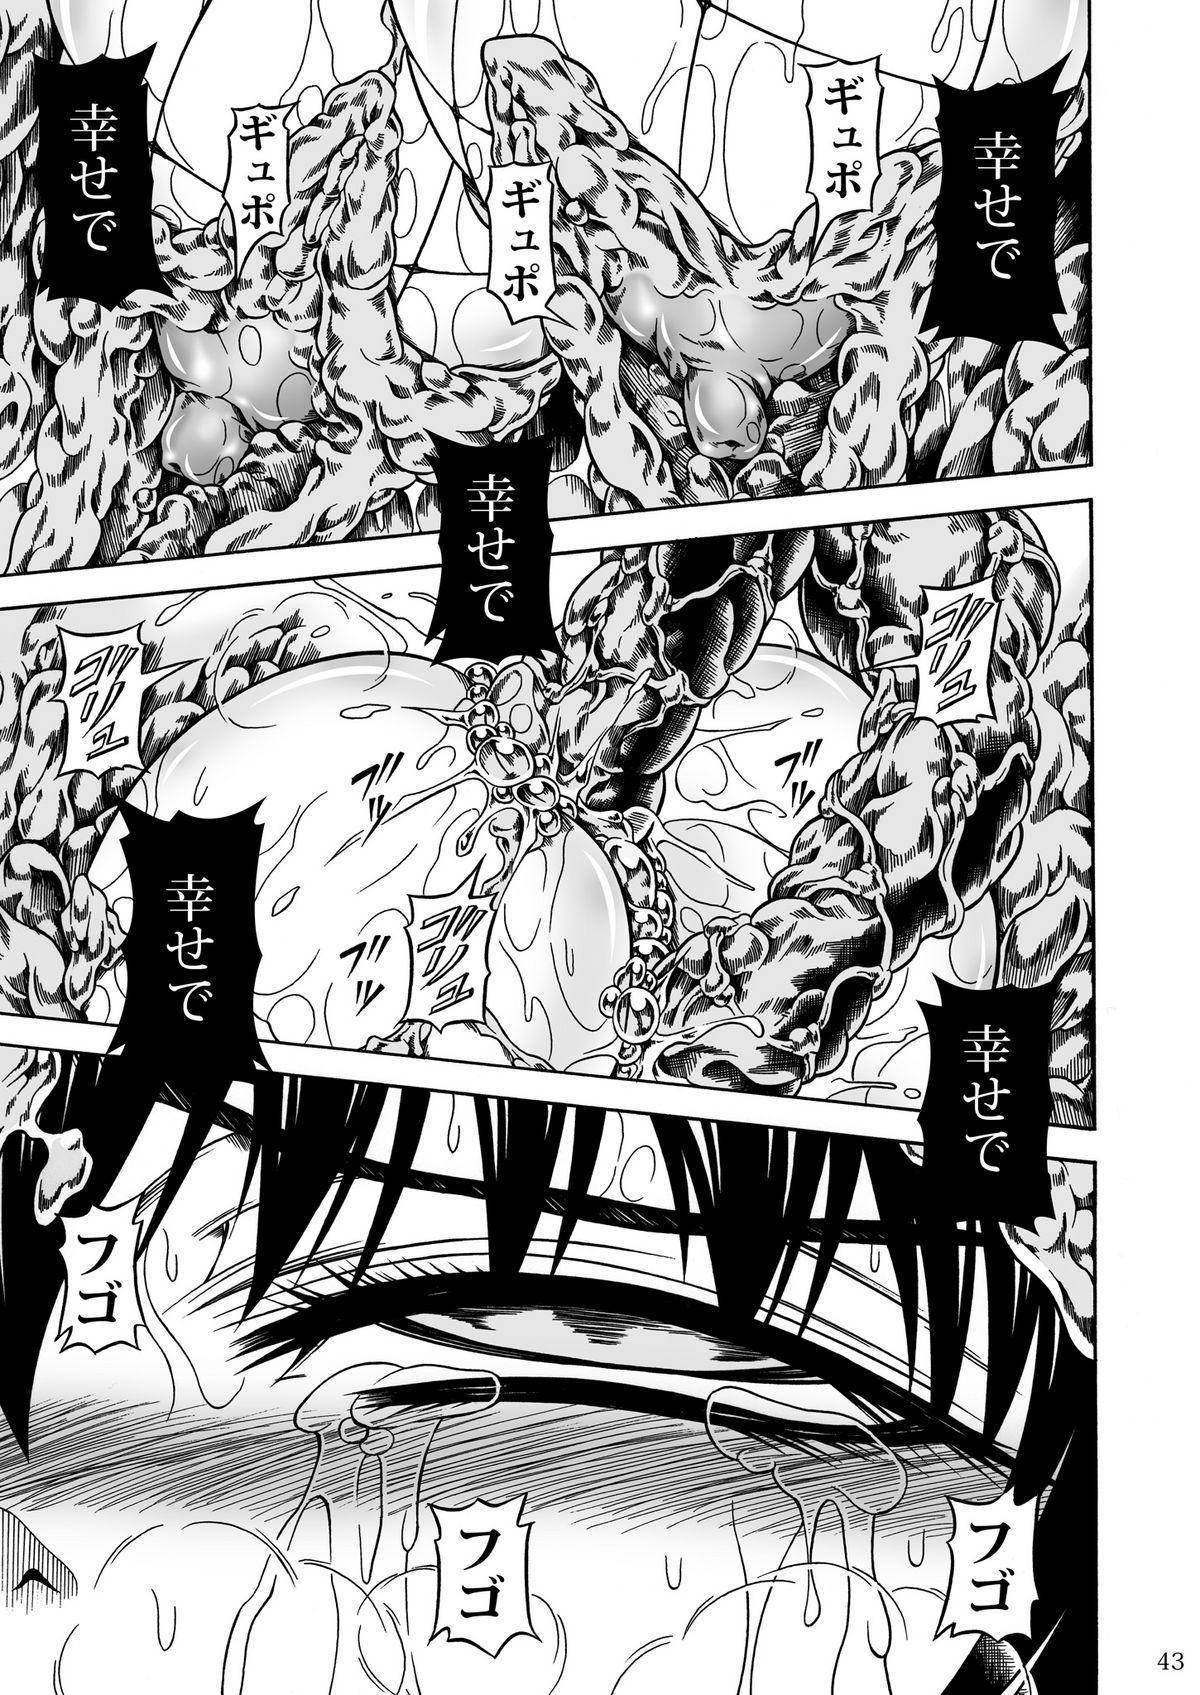 Solo Hunter no Seitai 2 The third part 42